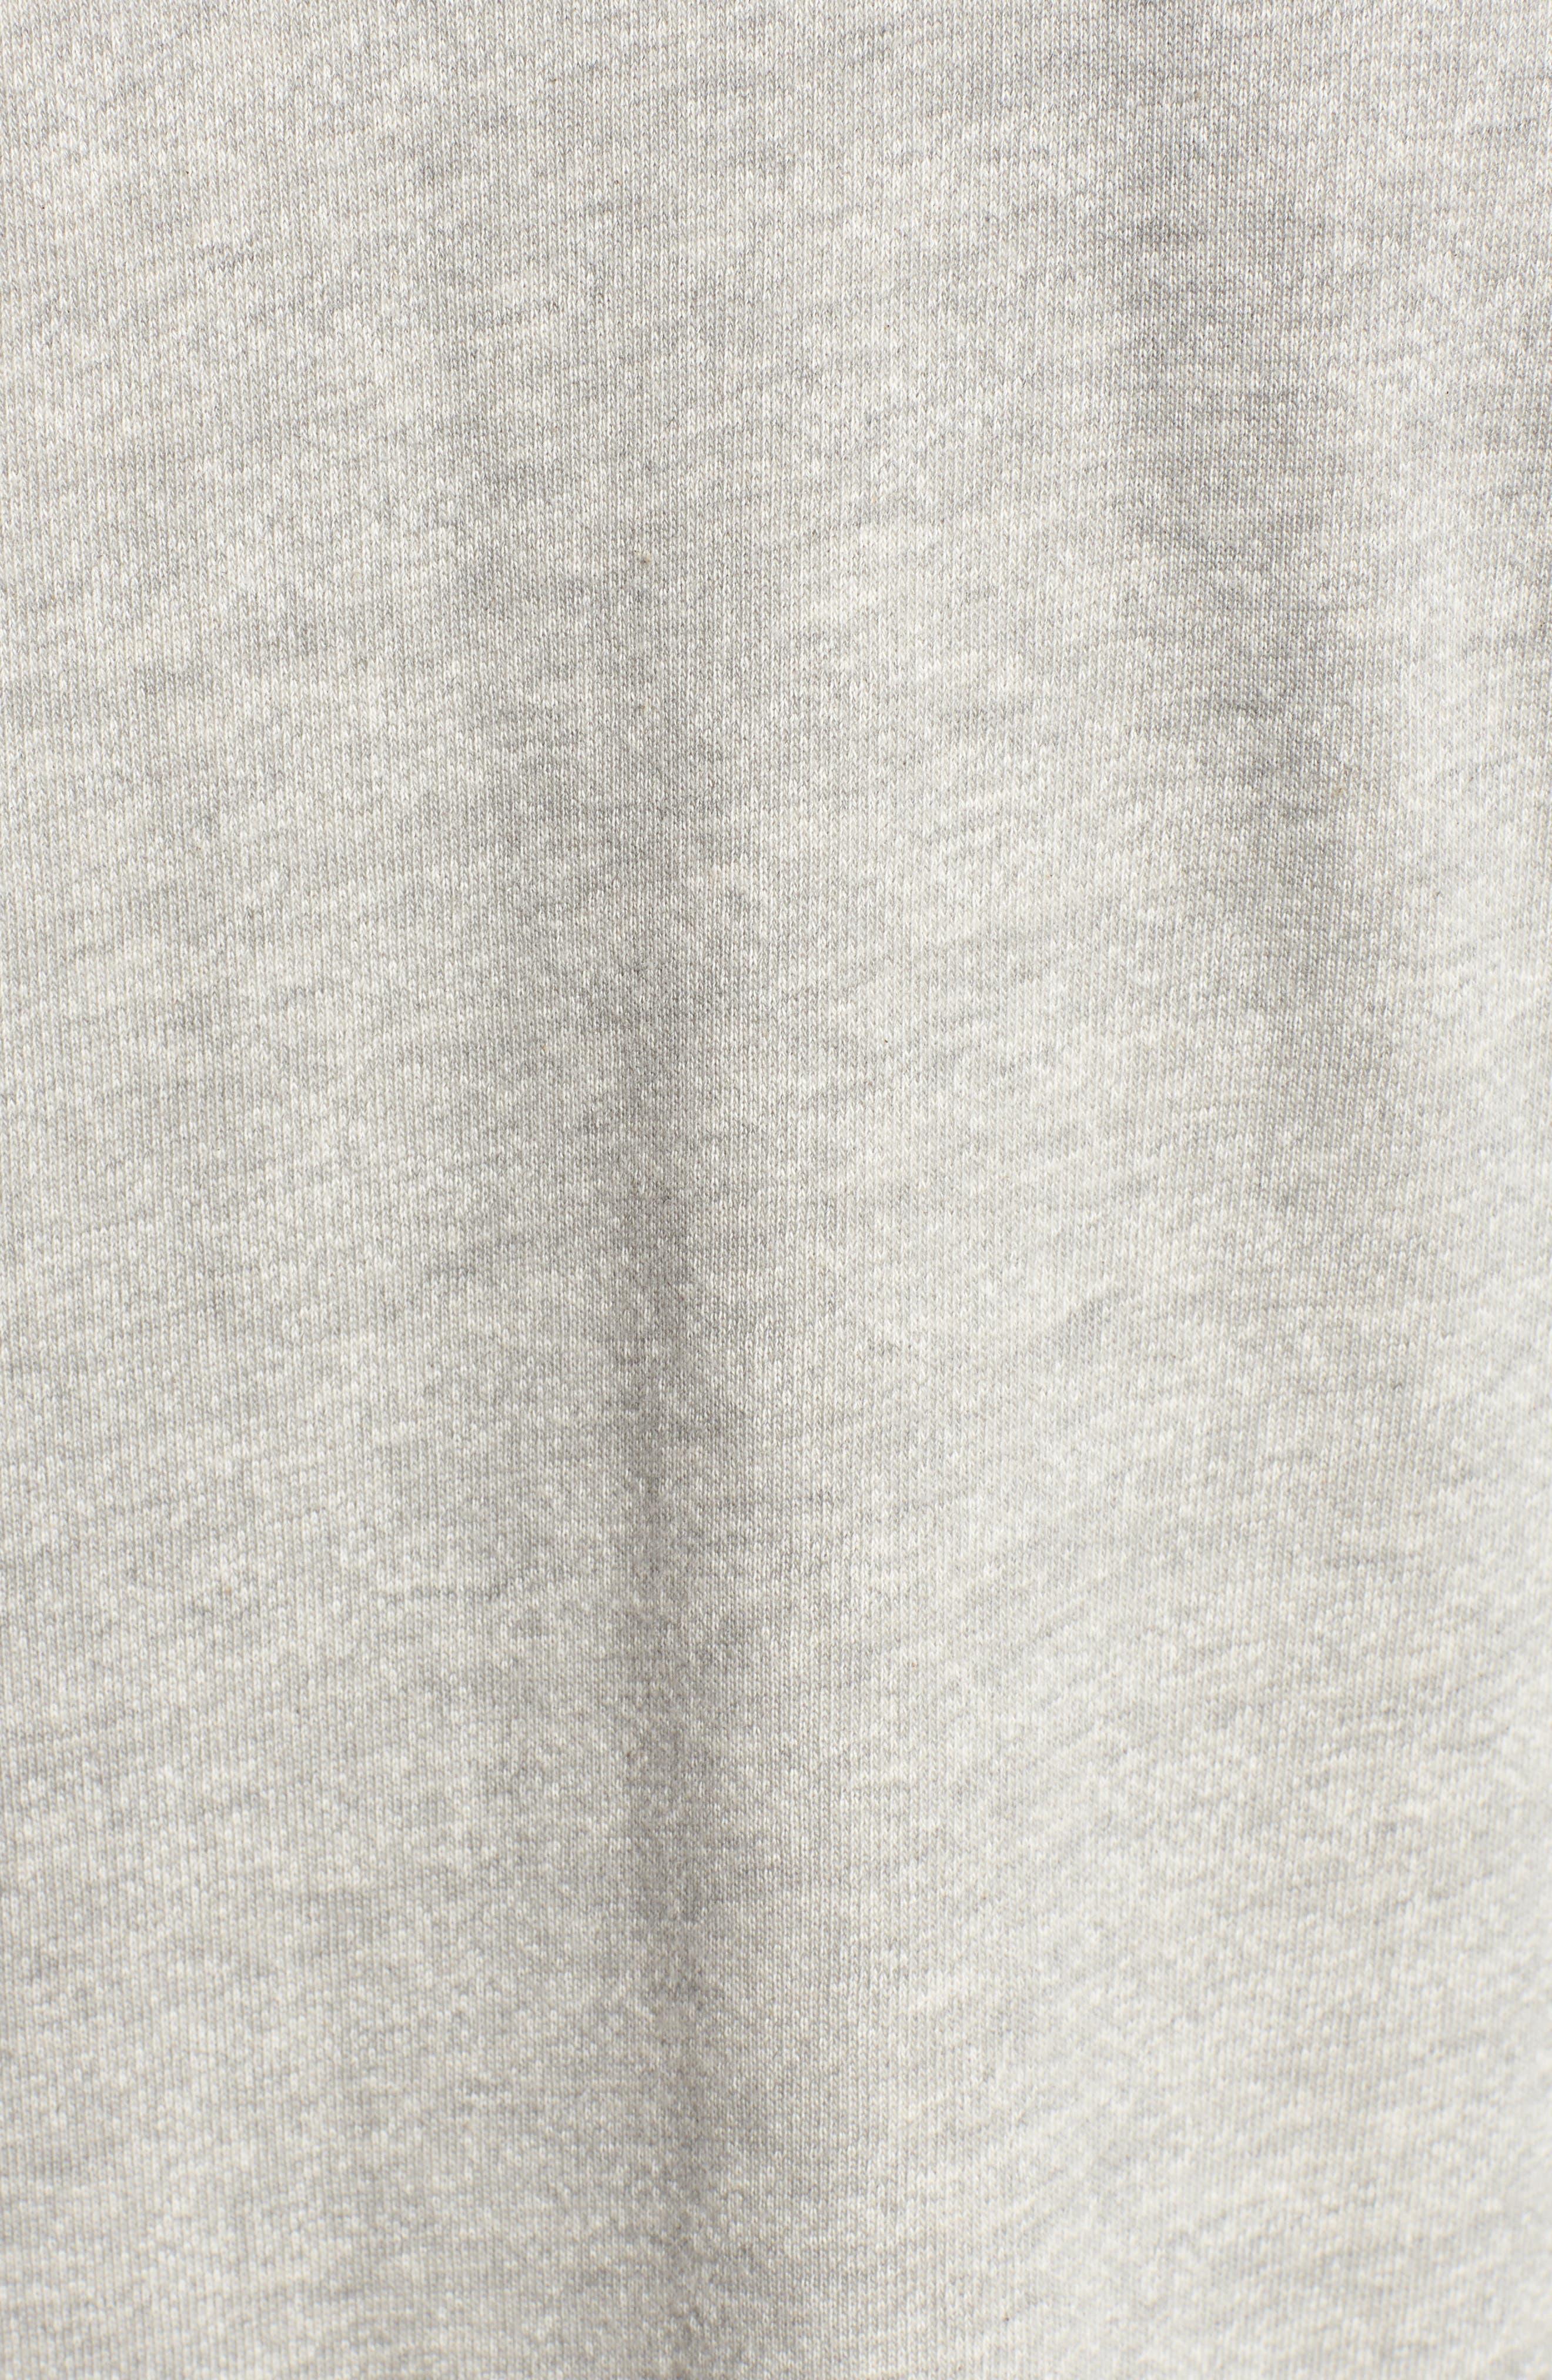 Off-Duty Roll Sleeve Cotton Blend Jacket,                             Alternate thumbnail 6, color,                             Grey Heather